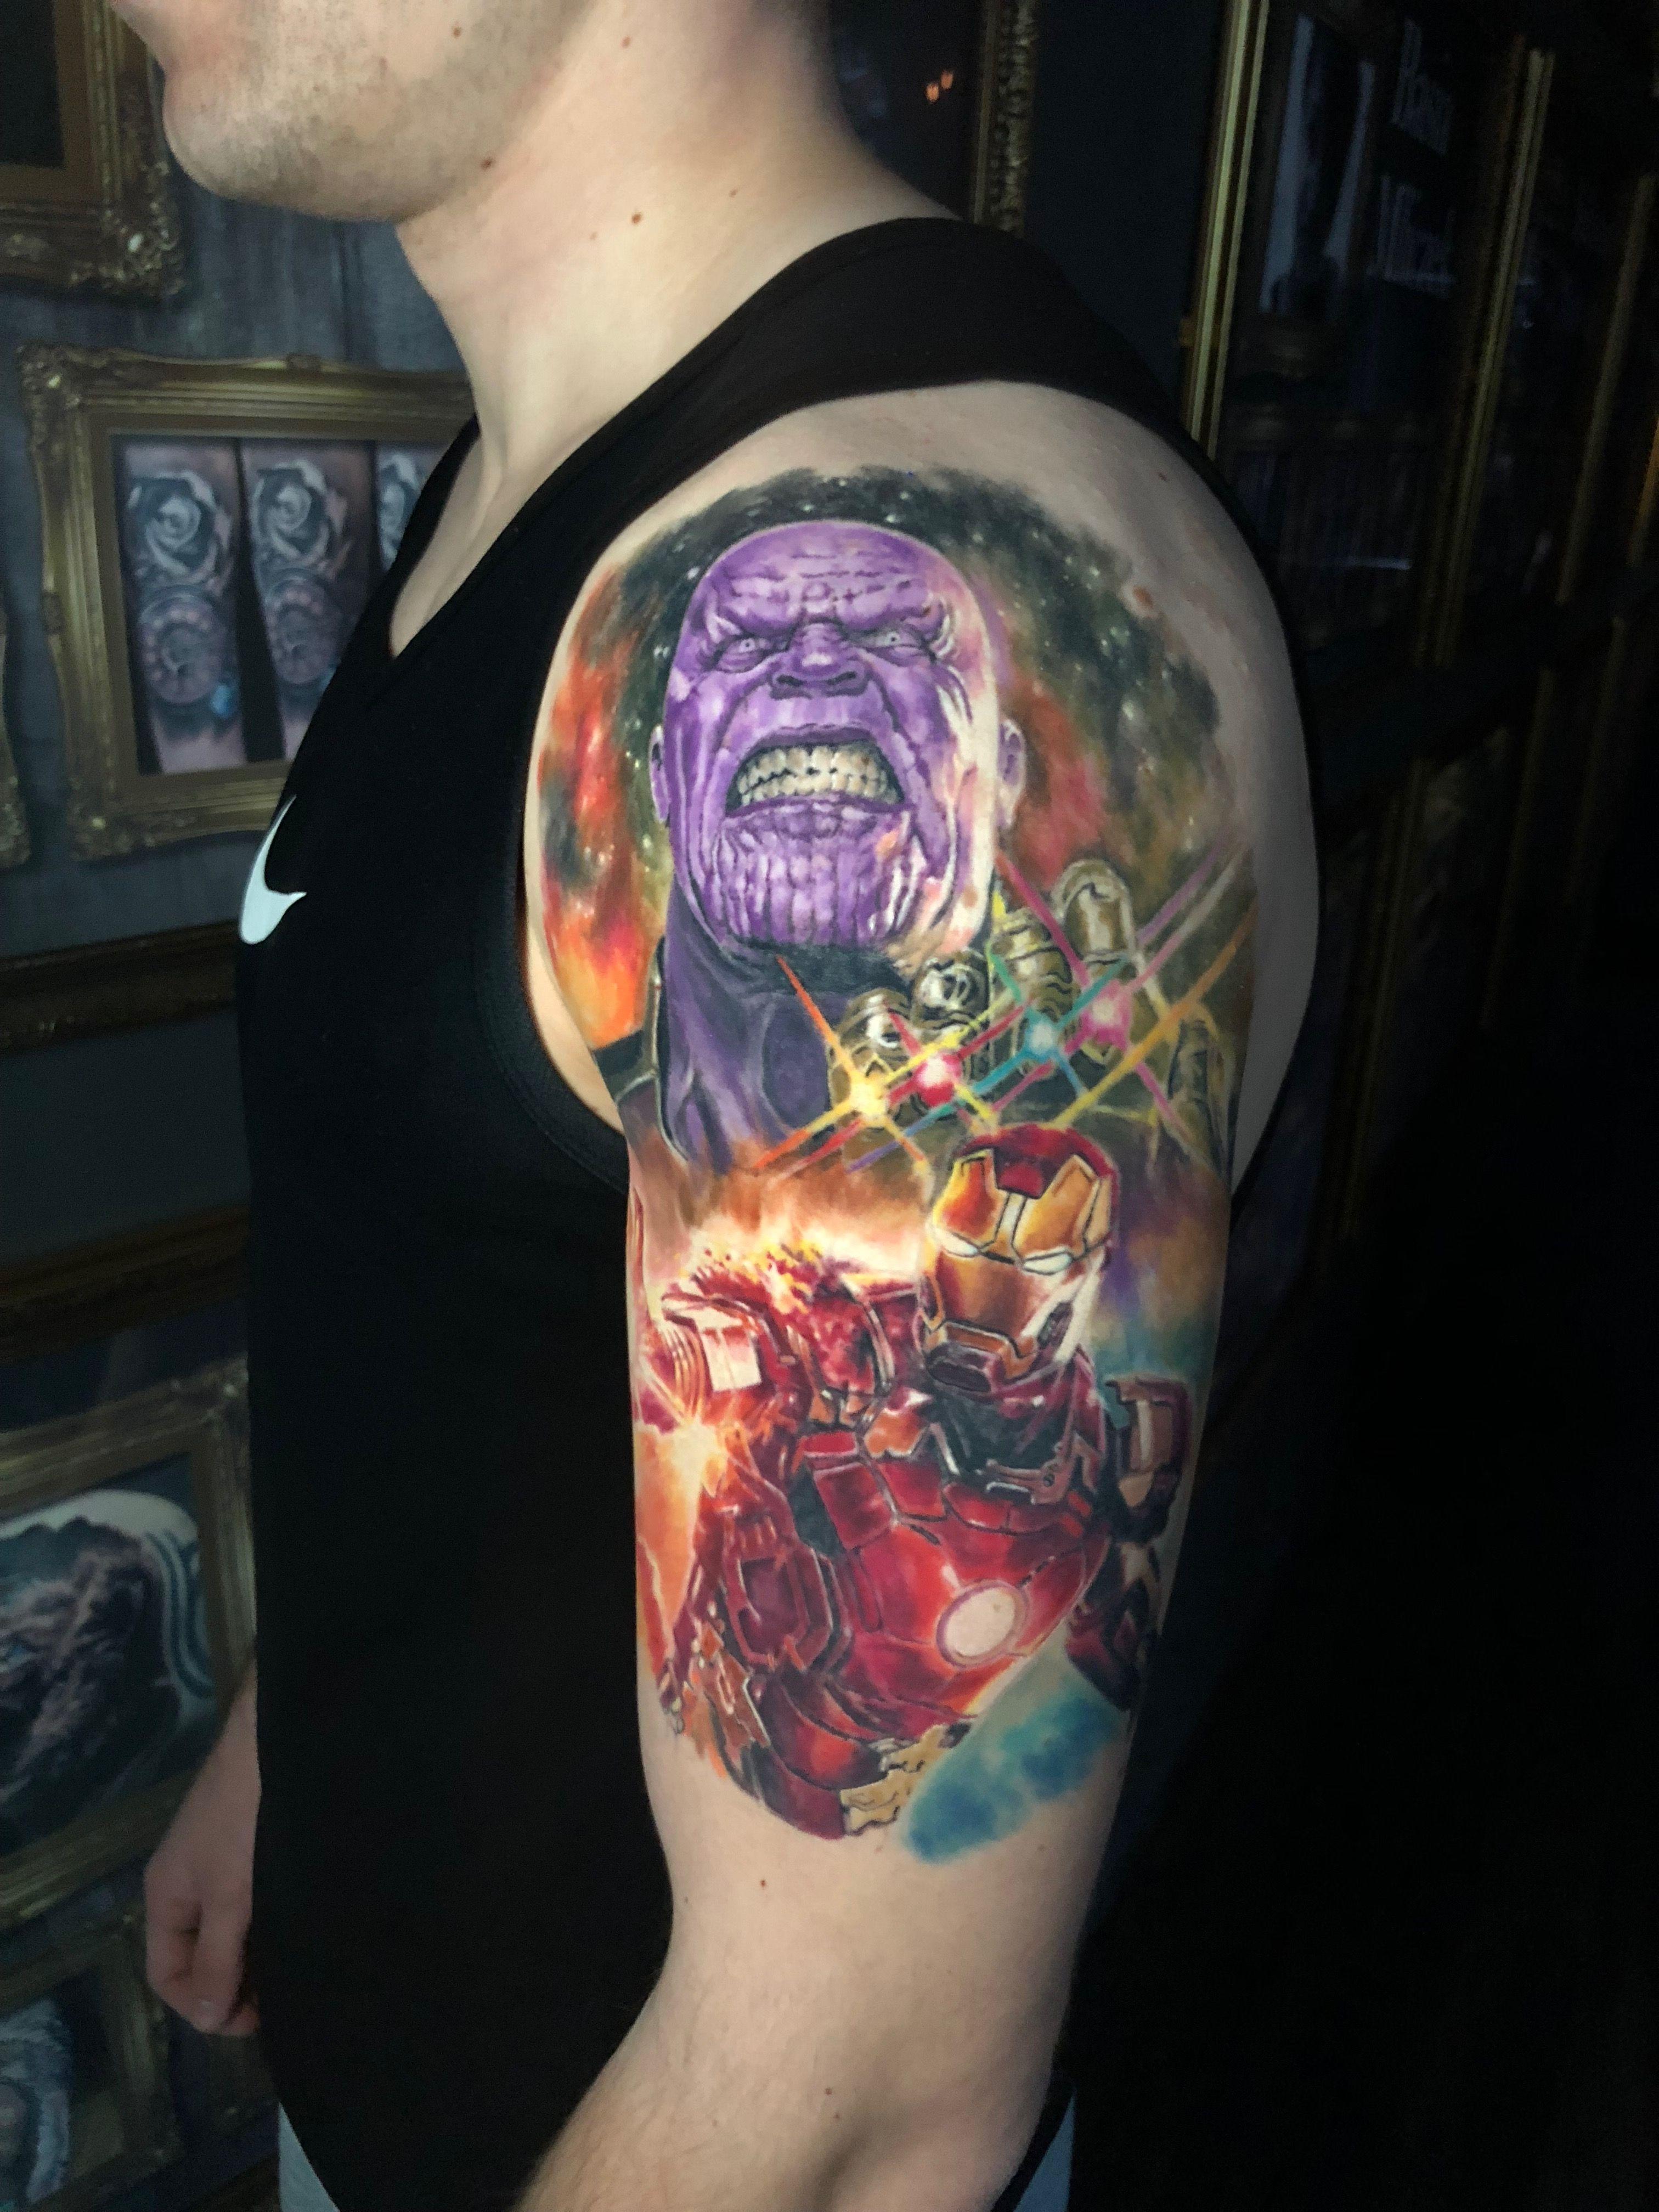 Fully healed marvel thanos ironman tattoo by roman